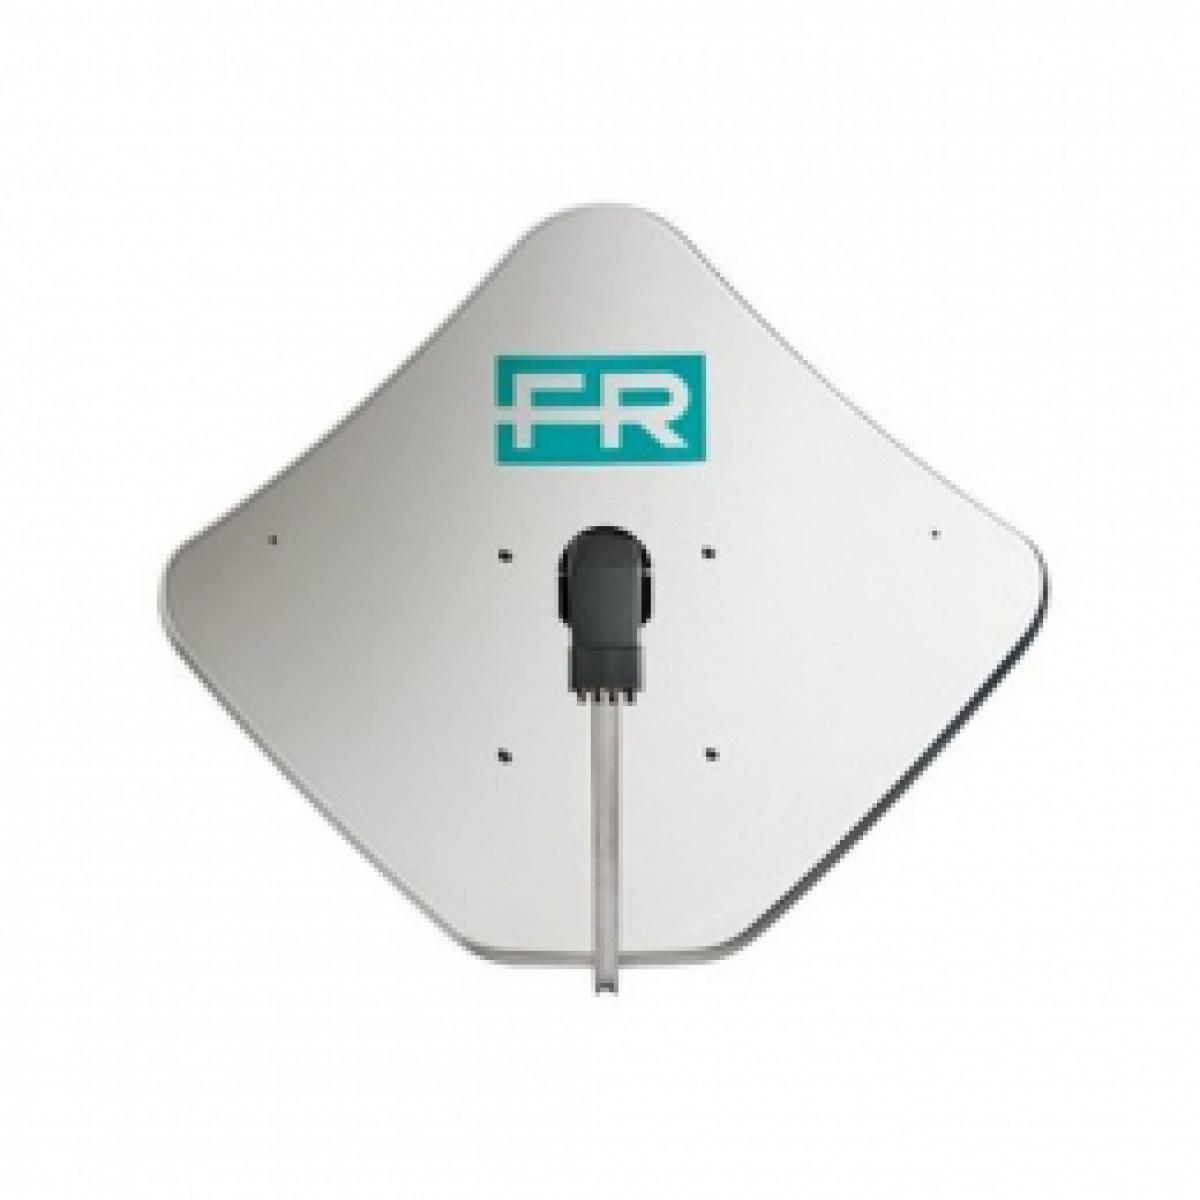 Antenna parabolica diametro 69 in acciaio bianco 211104 fracarro